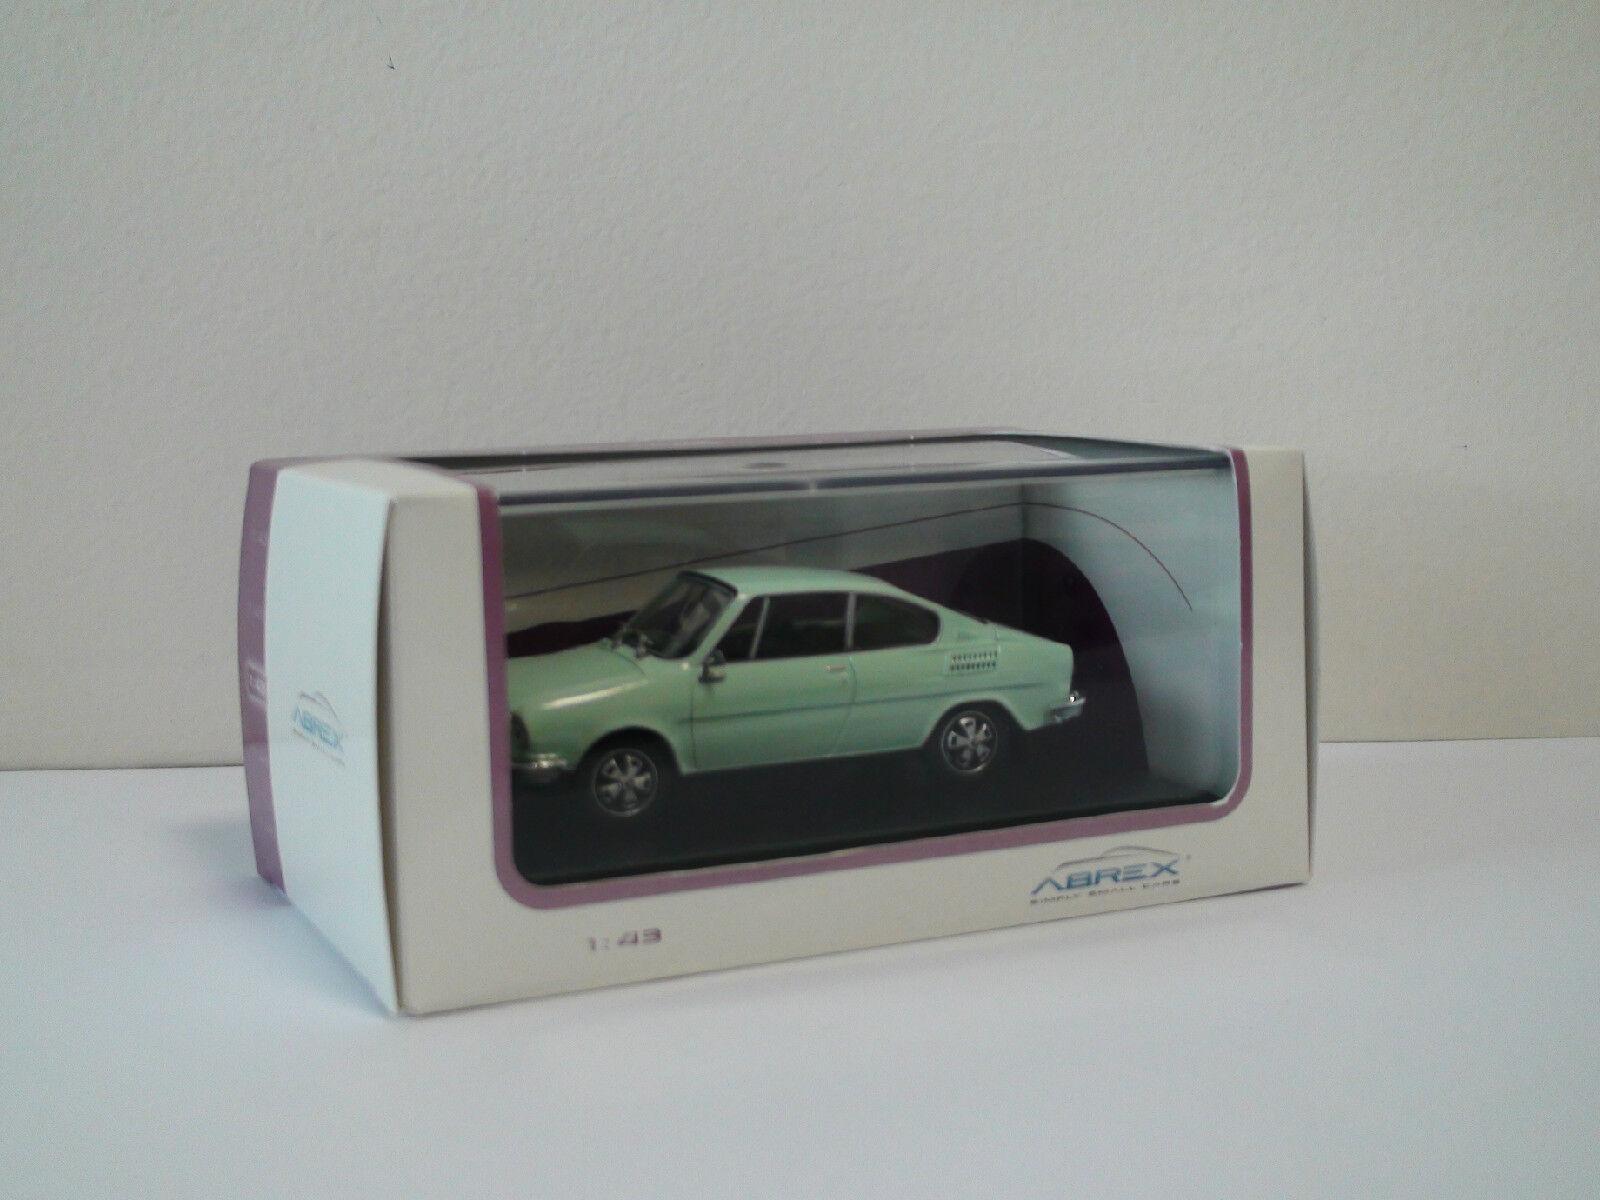 SKODA 110 R Coupe Coupe Coupe Diamante blancoo, 1 43 Abrex, sin pulir coches de culto eebdae